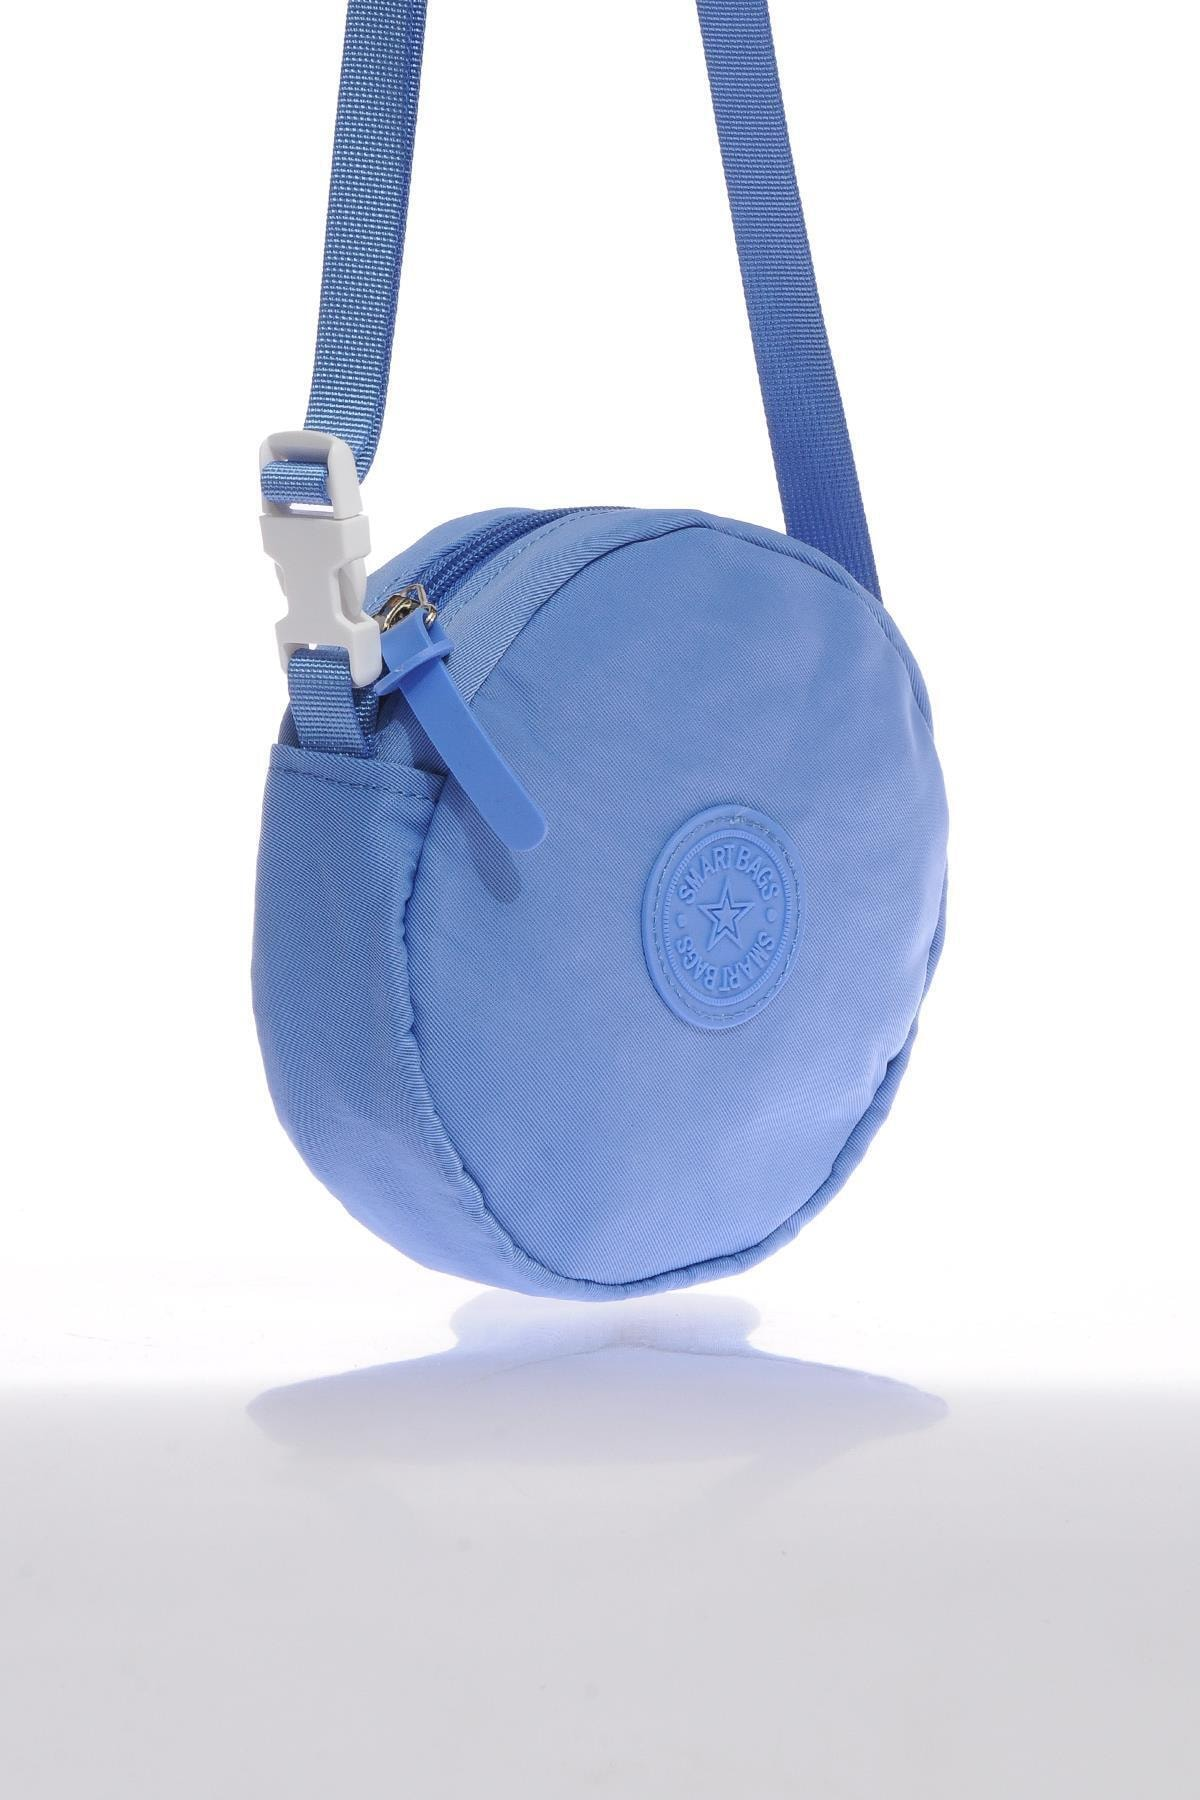 SMART BAGS Smb6001-0031 Mavi Kadın Minik Çapraz Çanta 2